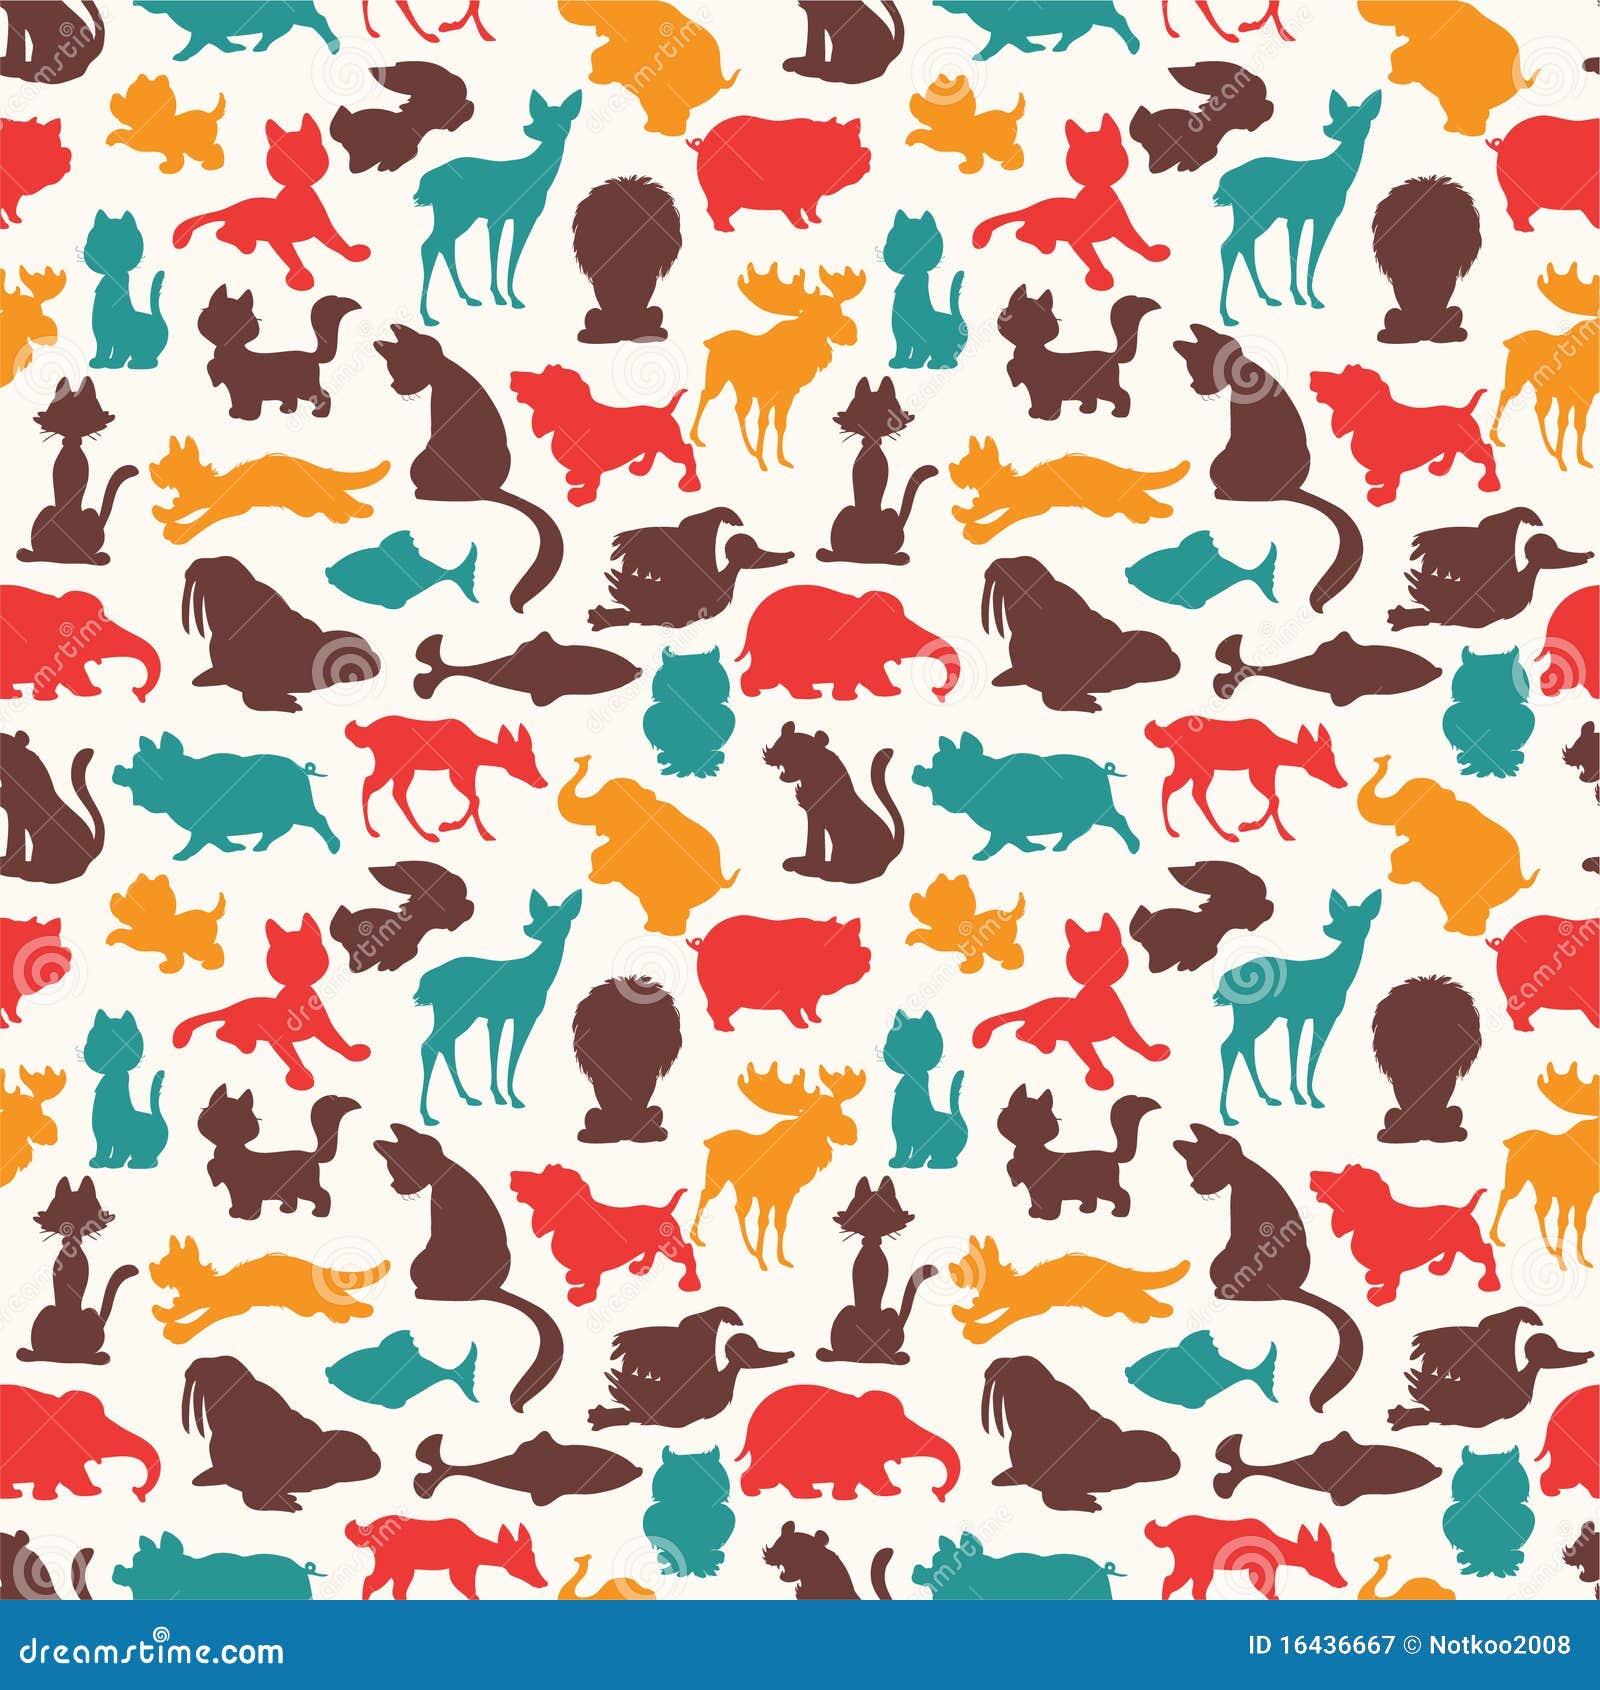 Seamless Animal Pattern Royalty Free Stock Photography